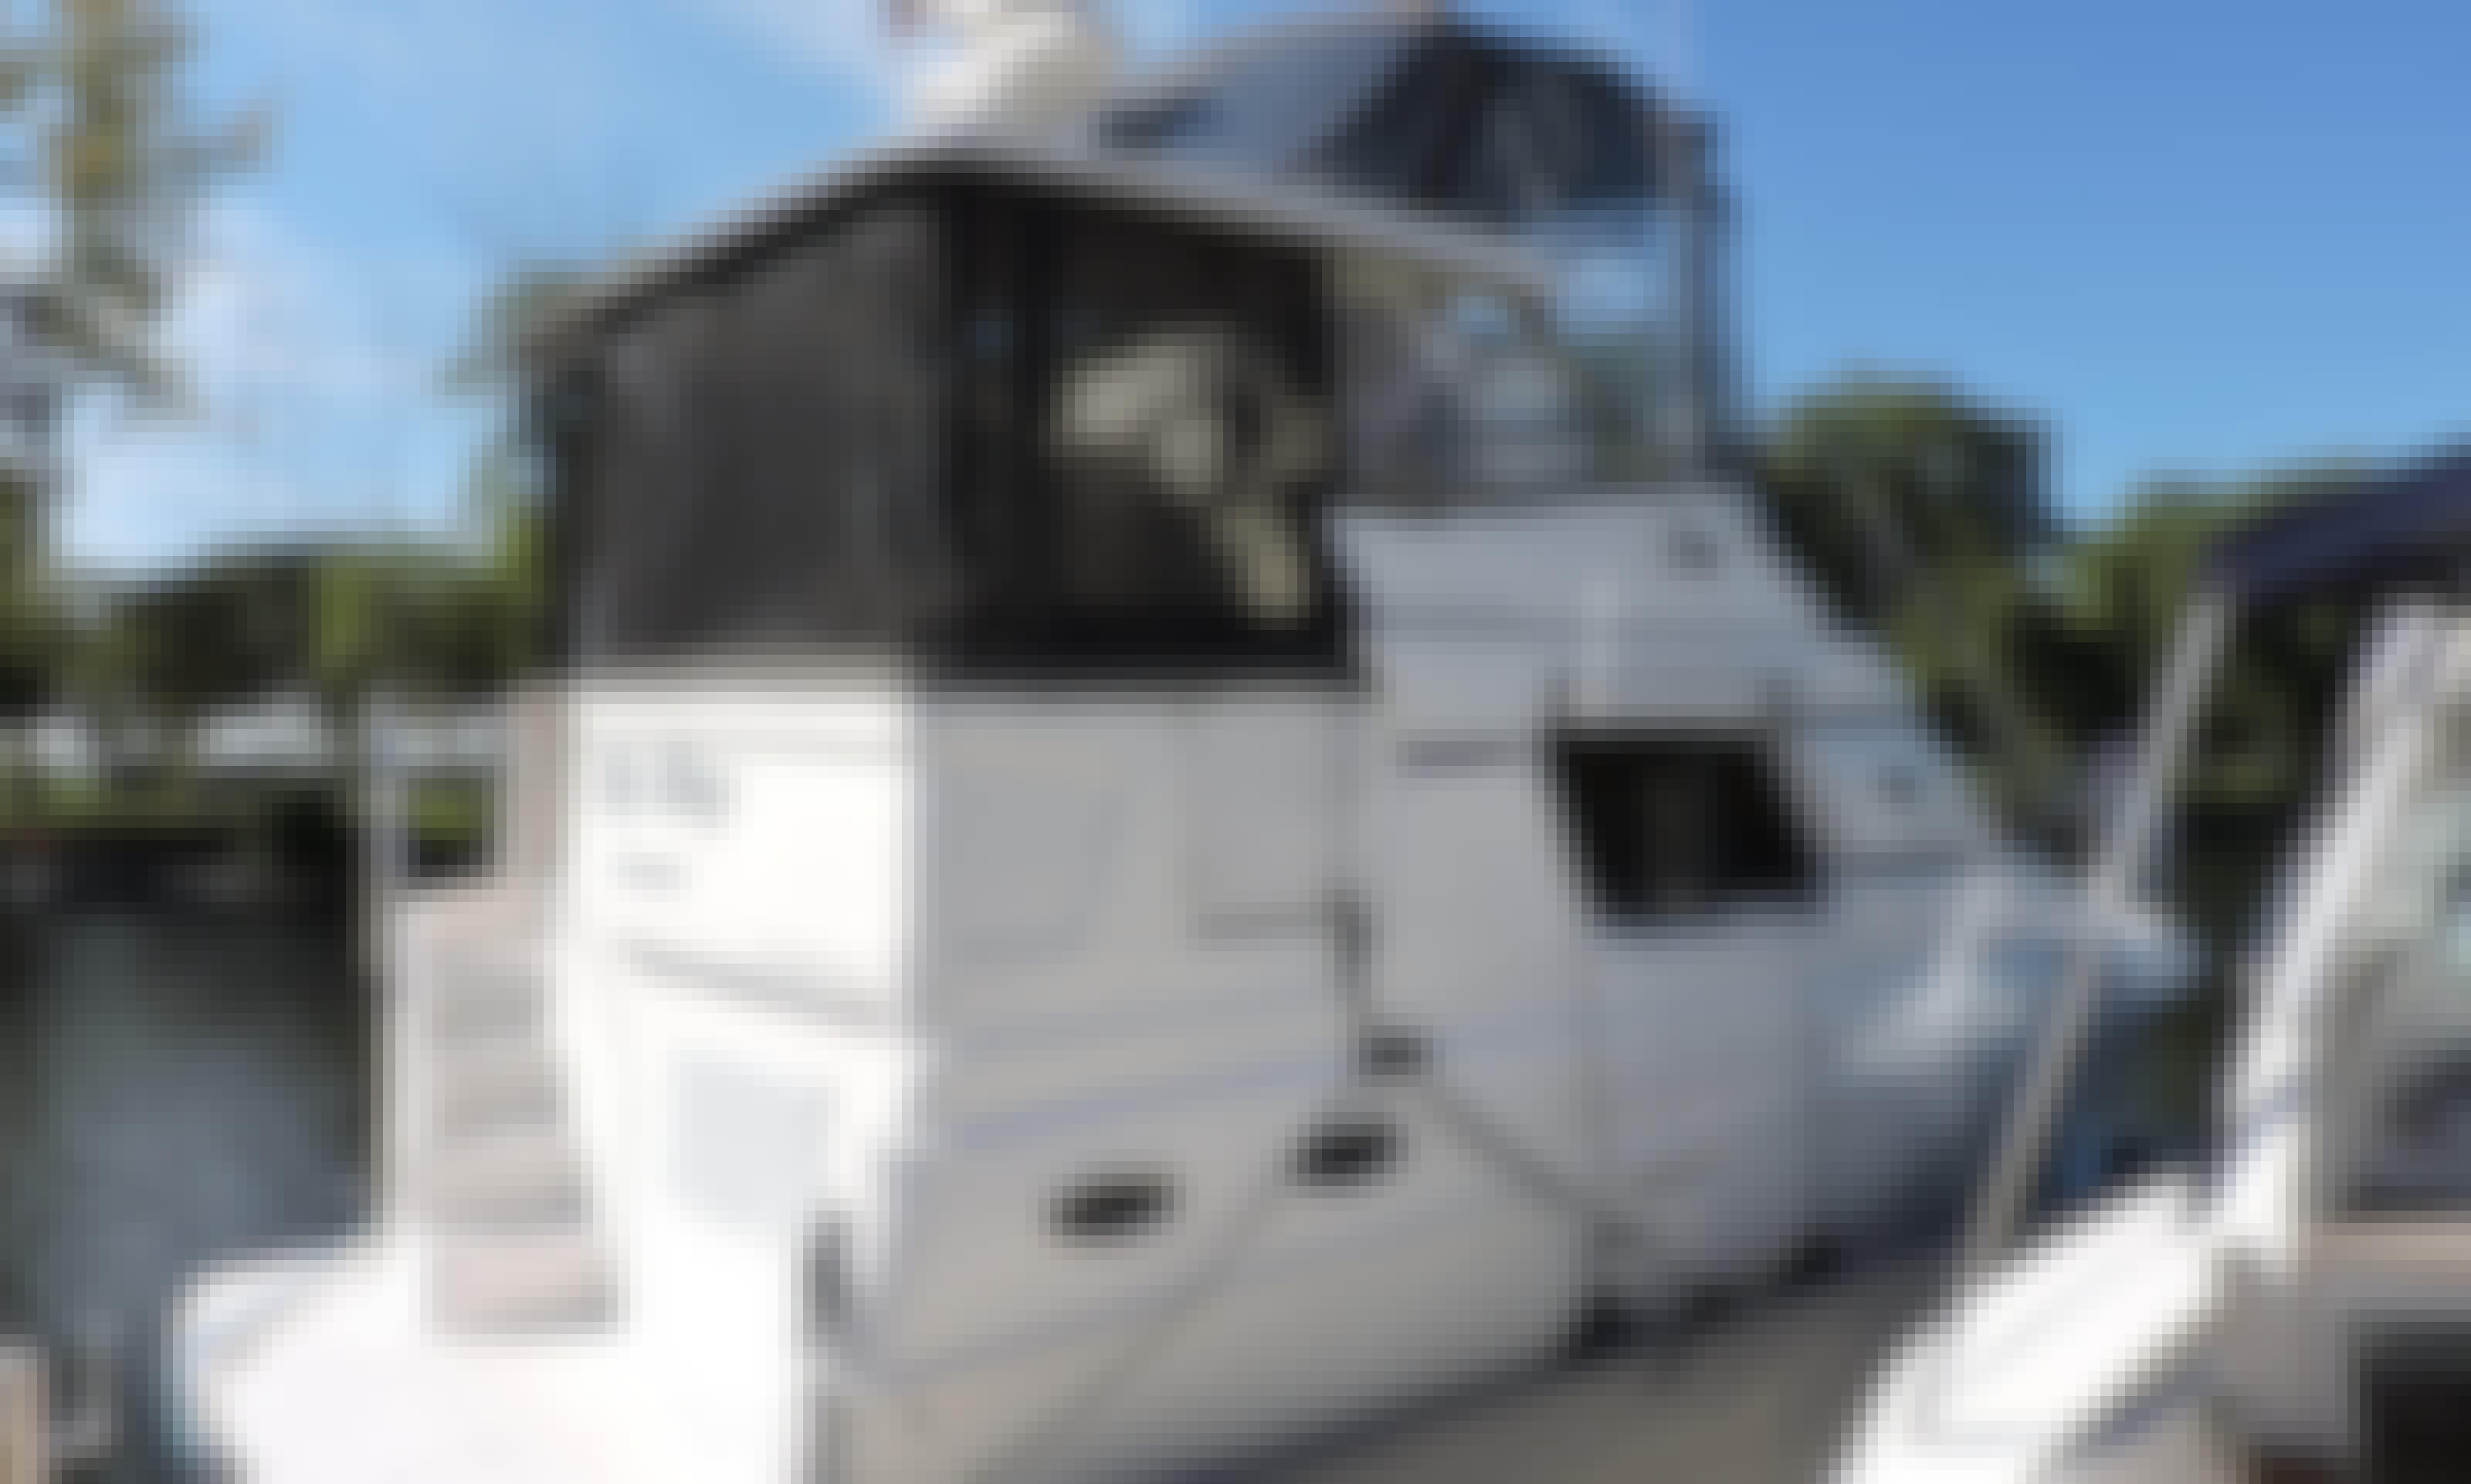 Motor Yacht rental in Innisfil